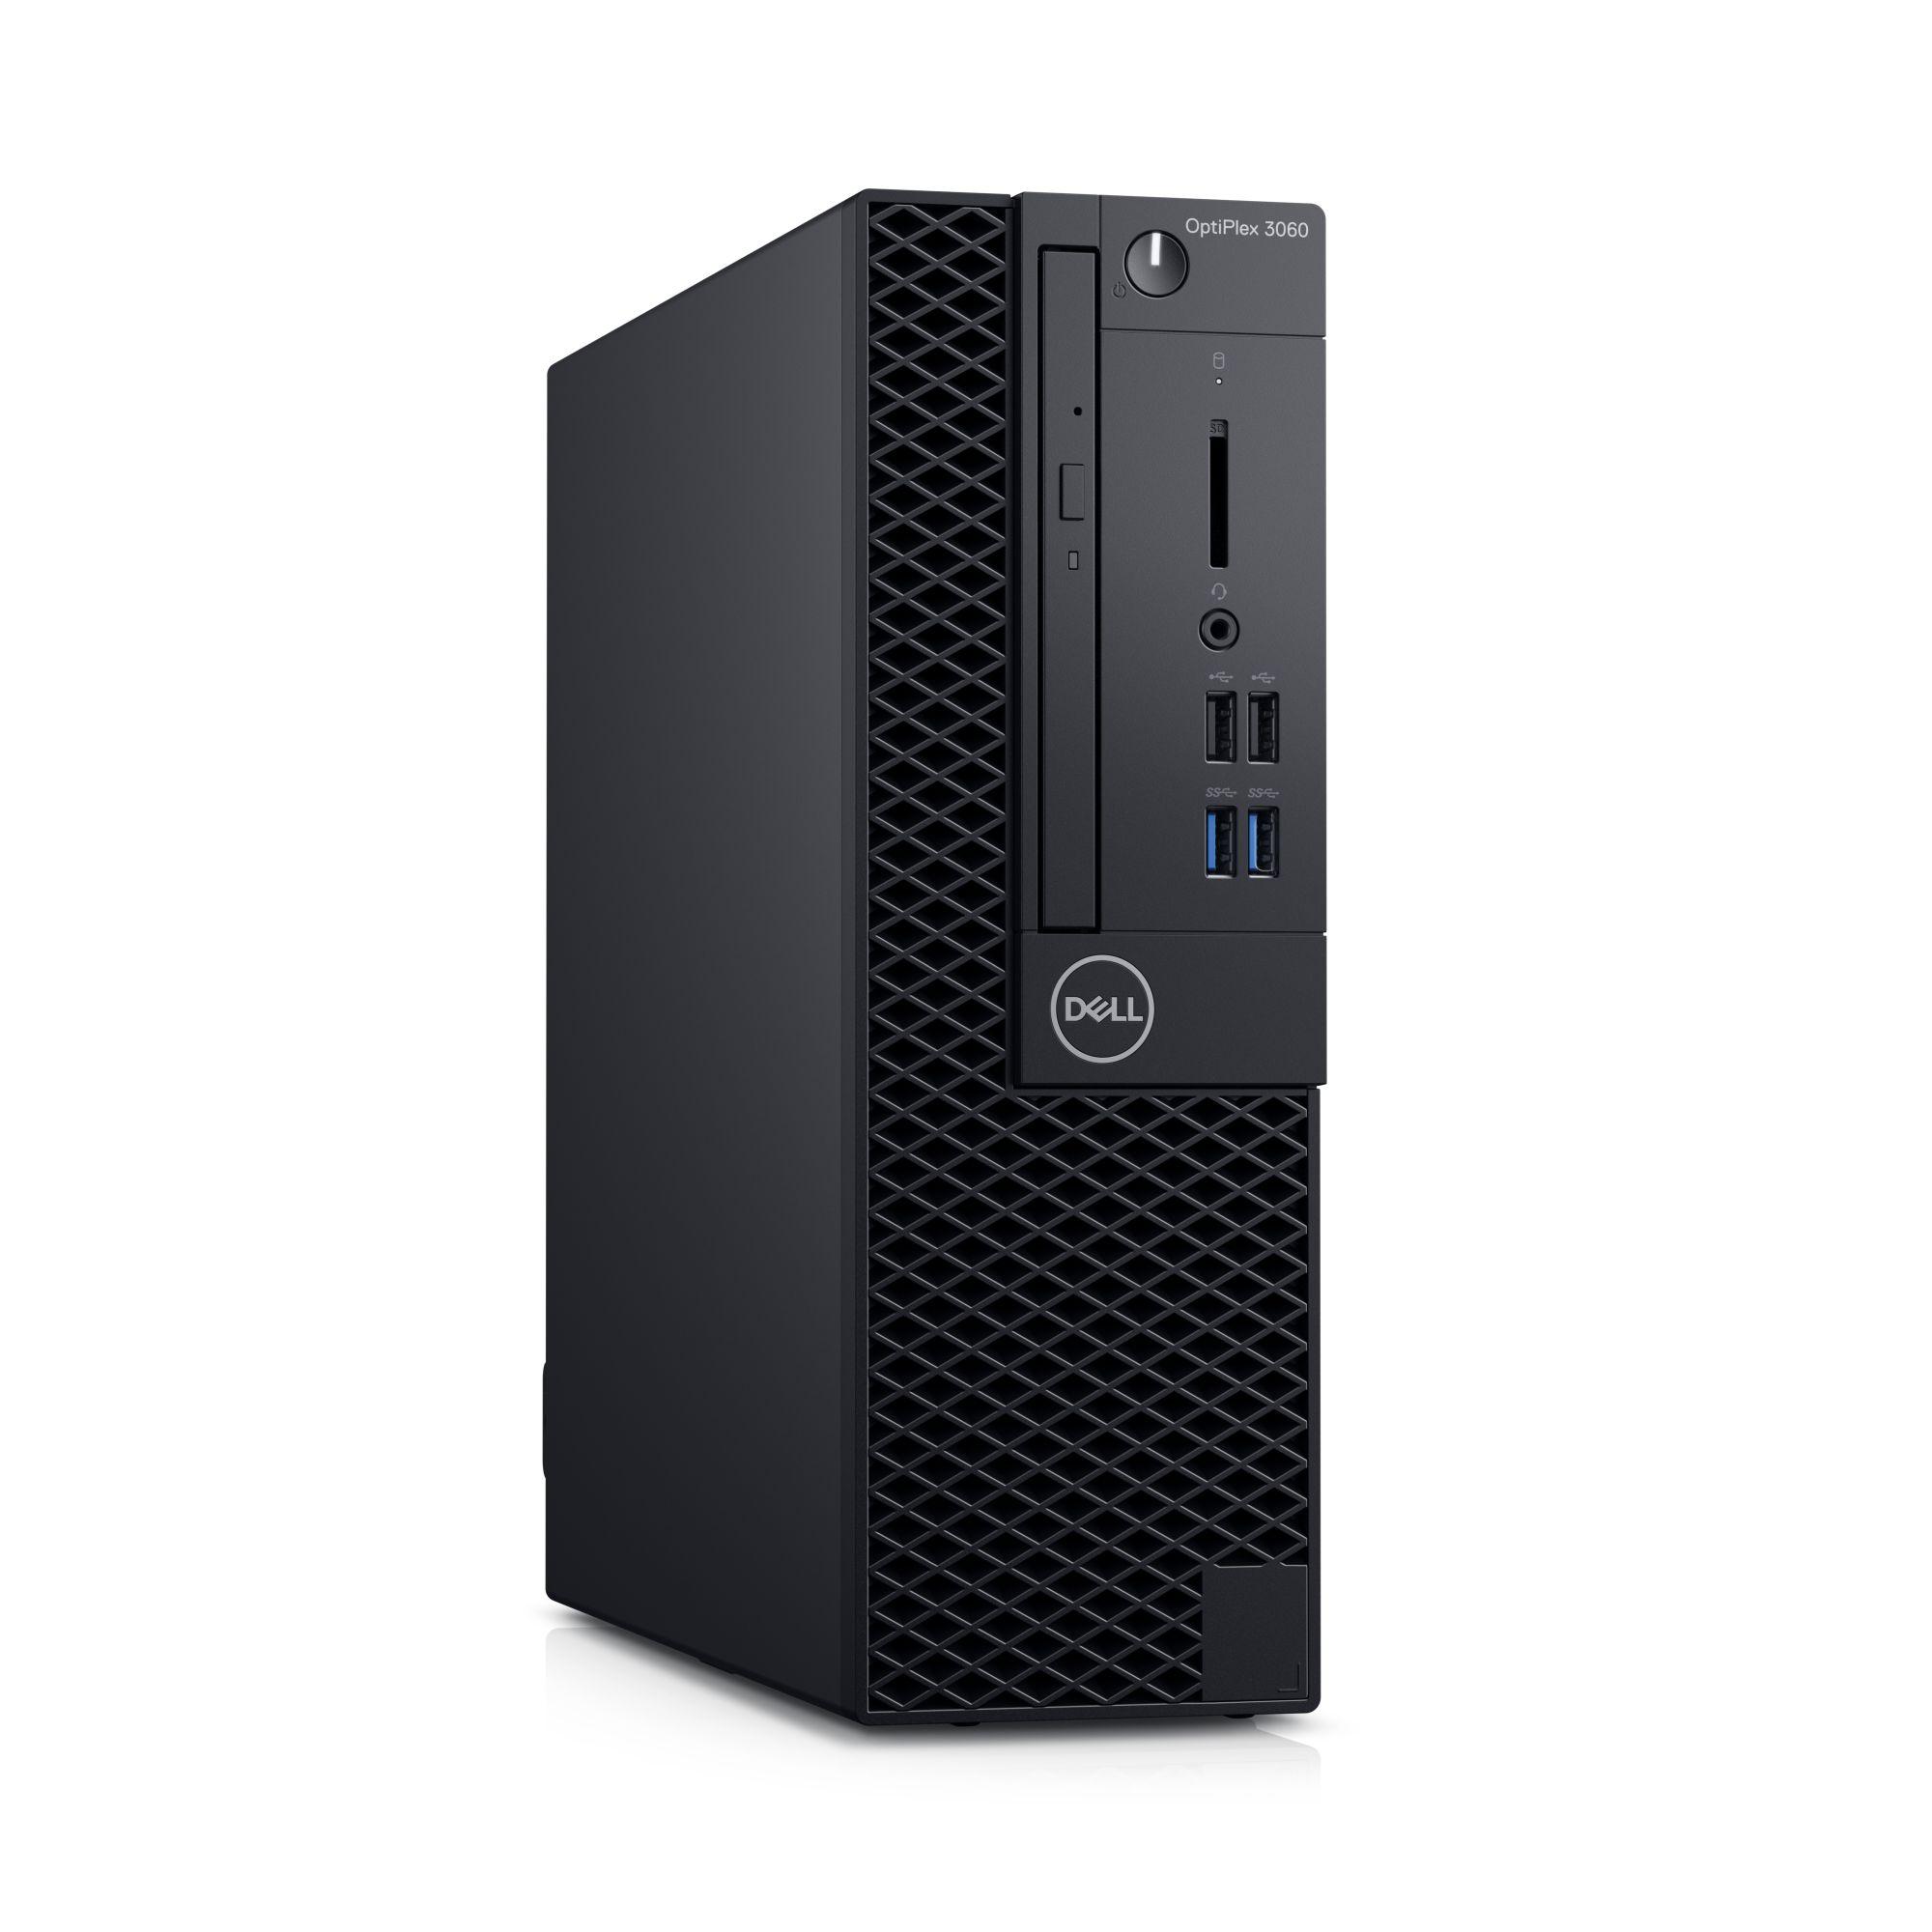 Dell PC Optiplex 3060 SF i3-8100/4GB/128GB SSD/HDMI/DP/DVD/W10P/3RNBD